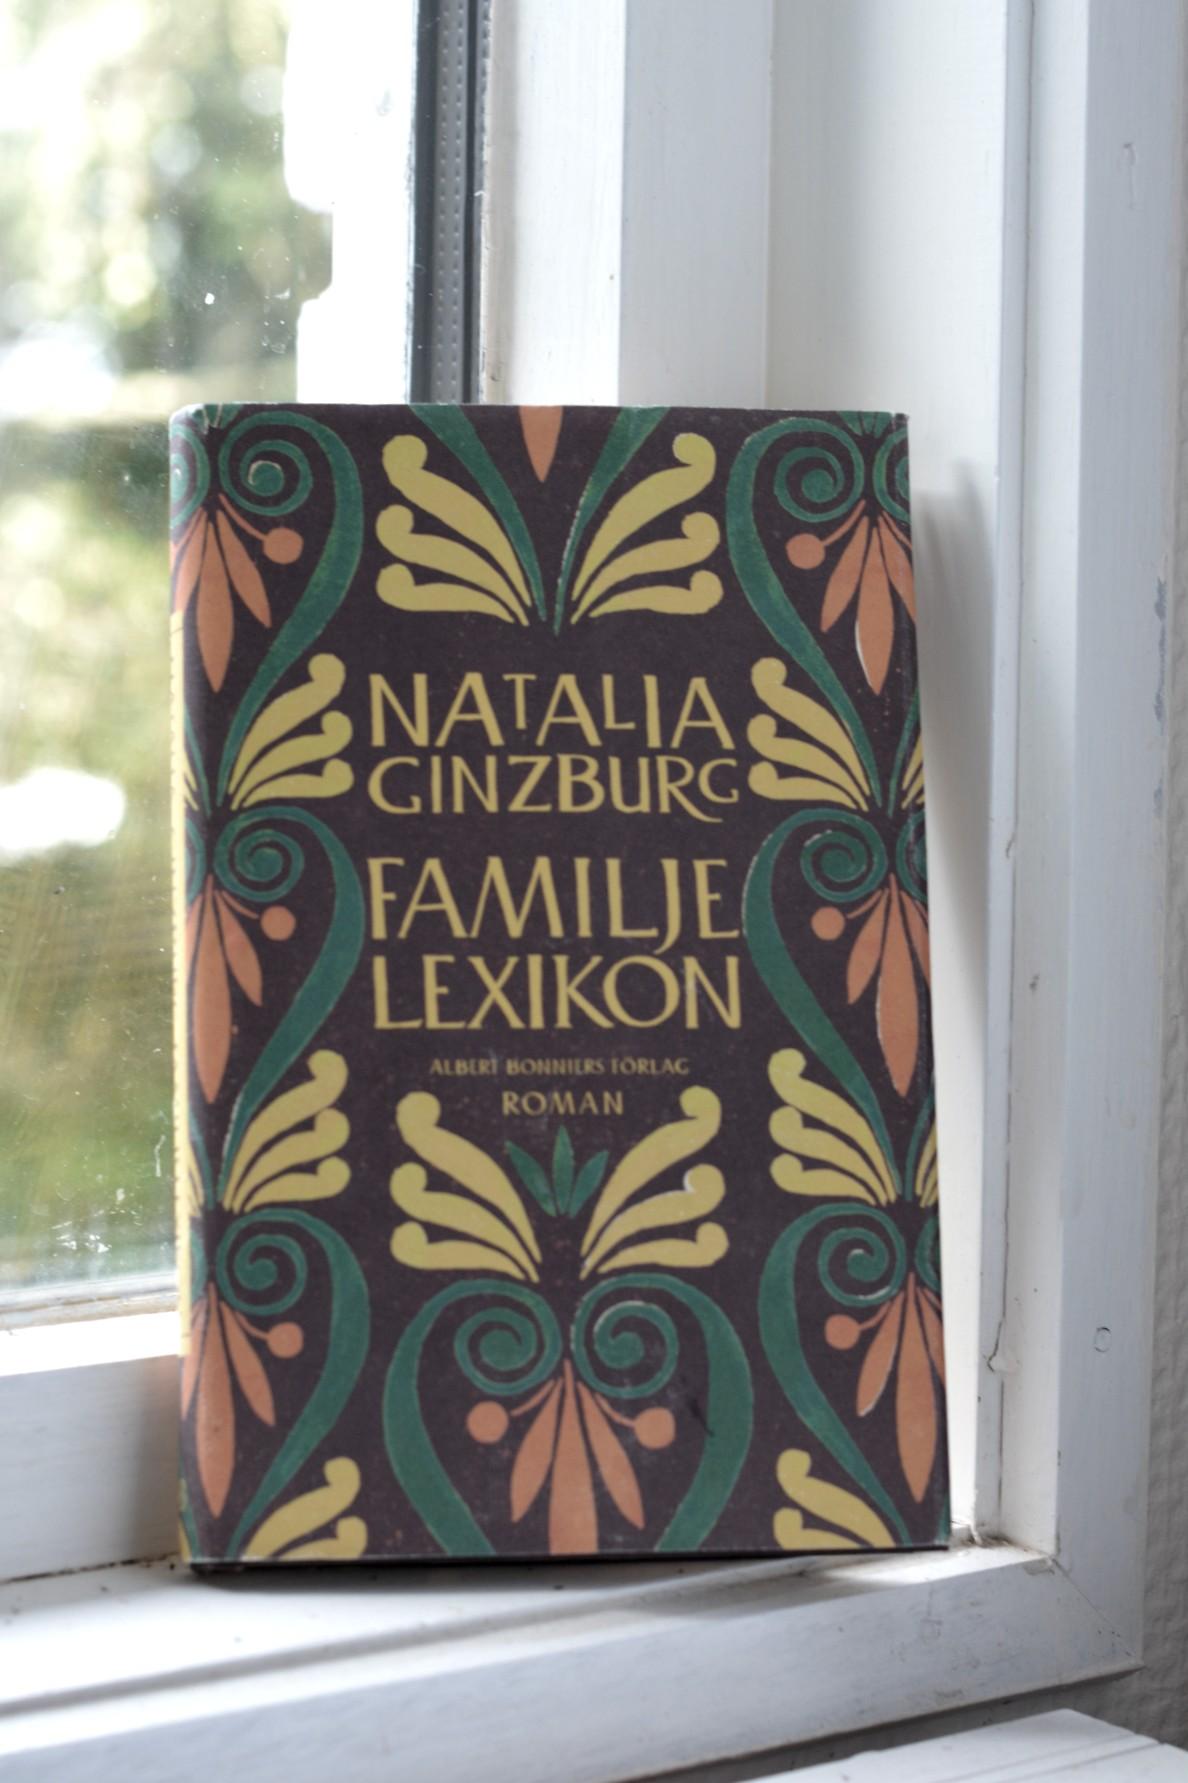 Familjelexikon av Natalia Ginzburg